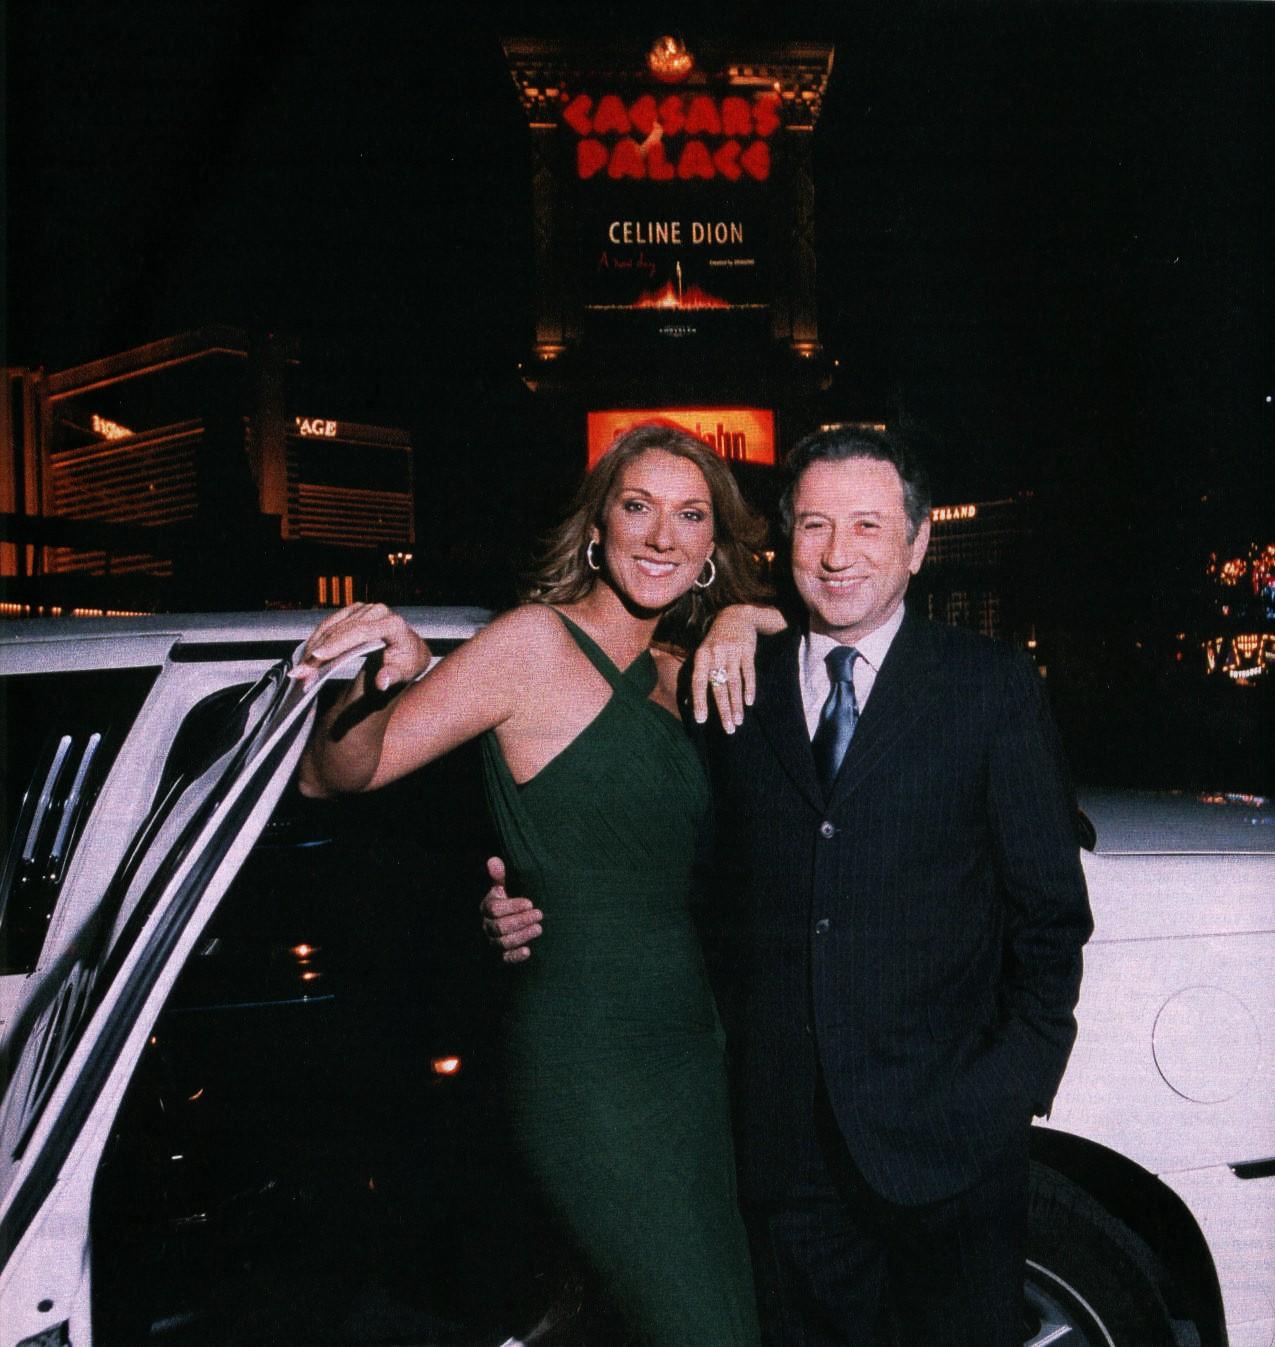 Celine Dion With Michel Drucker Celinedionweb Com